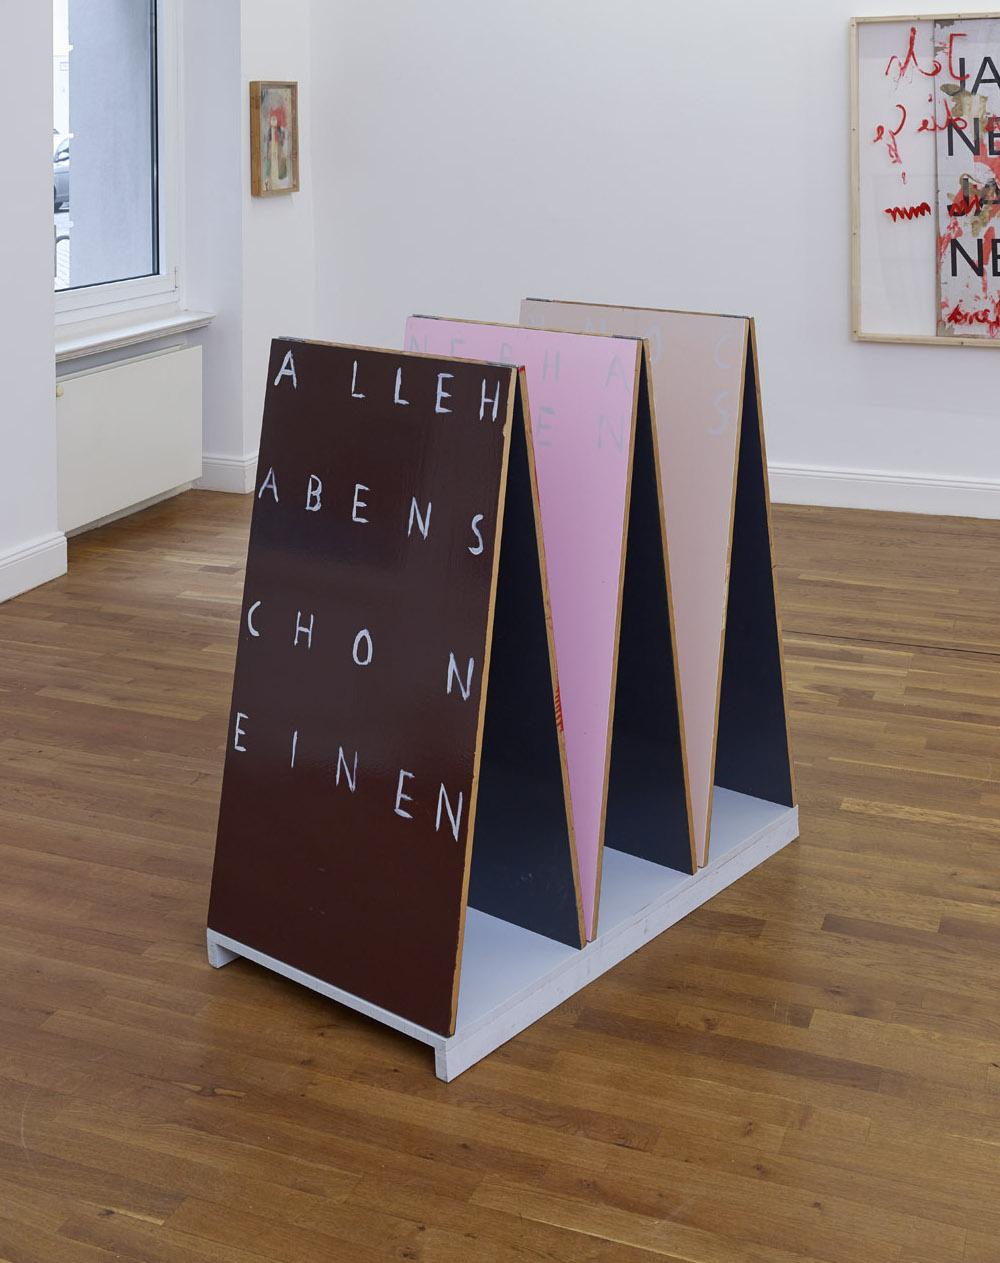 o.T. | 2011 | Holz, Lack | 122 x 117 x 56,5 cm